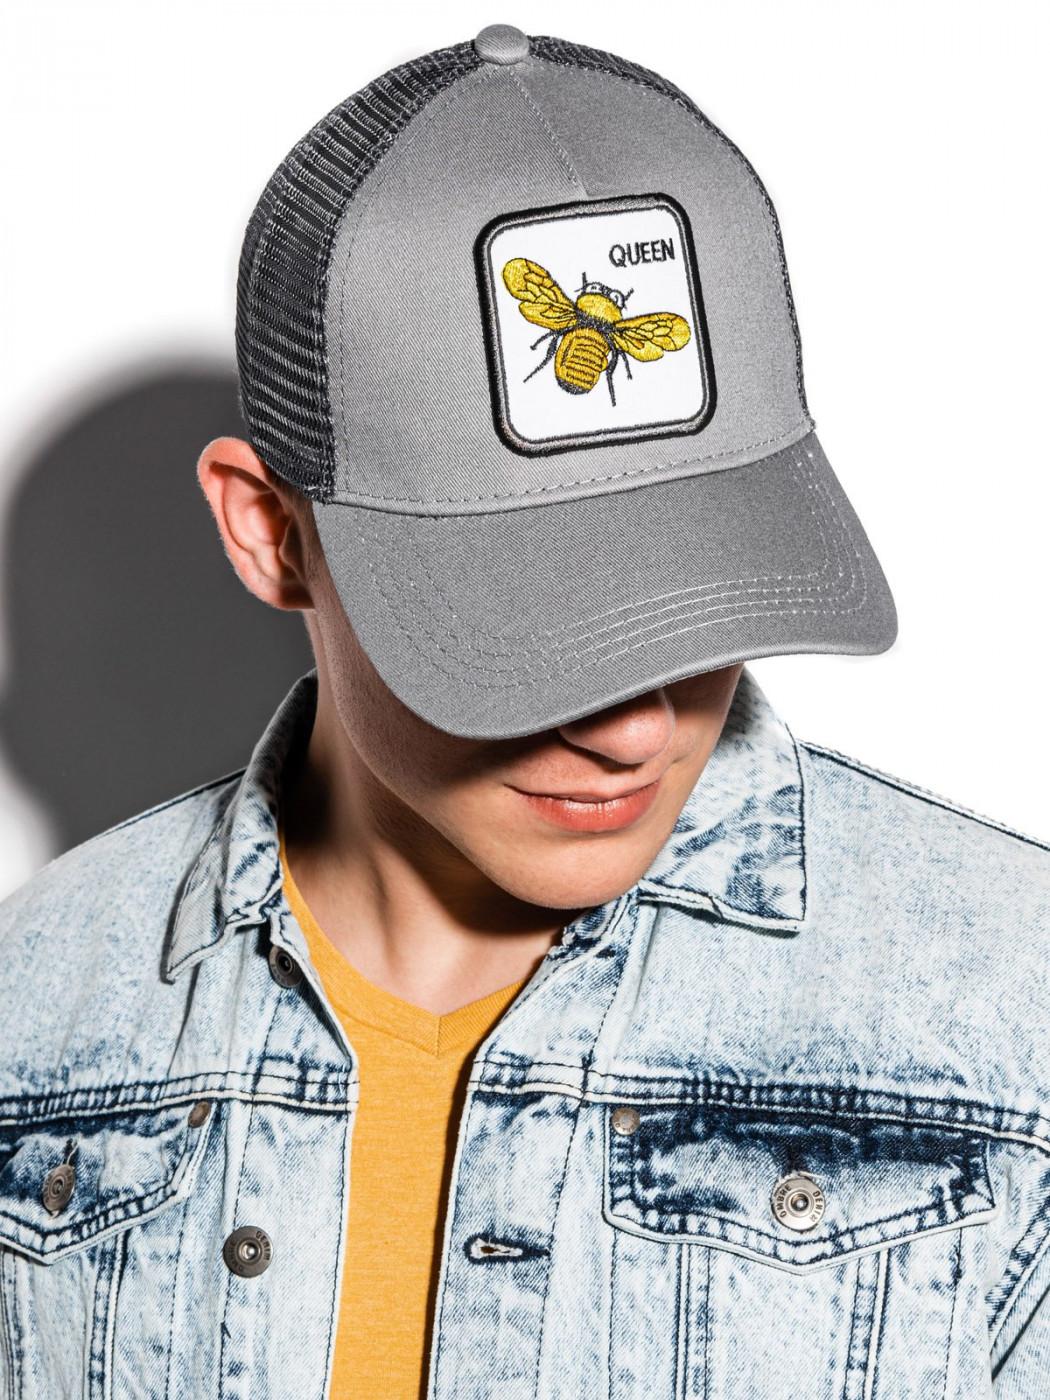 Ombre Clothing Men's cap H067